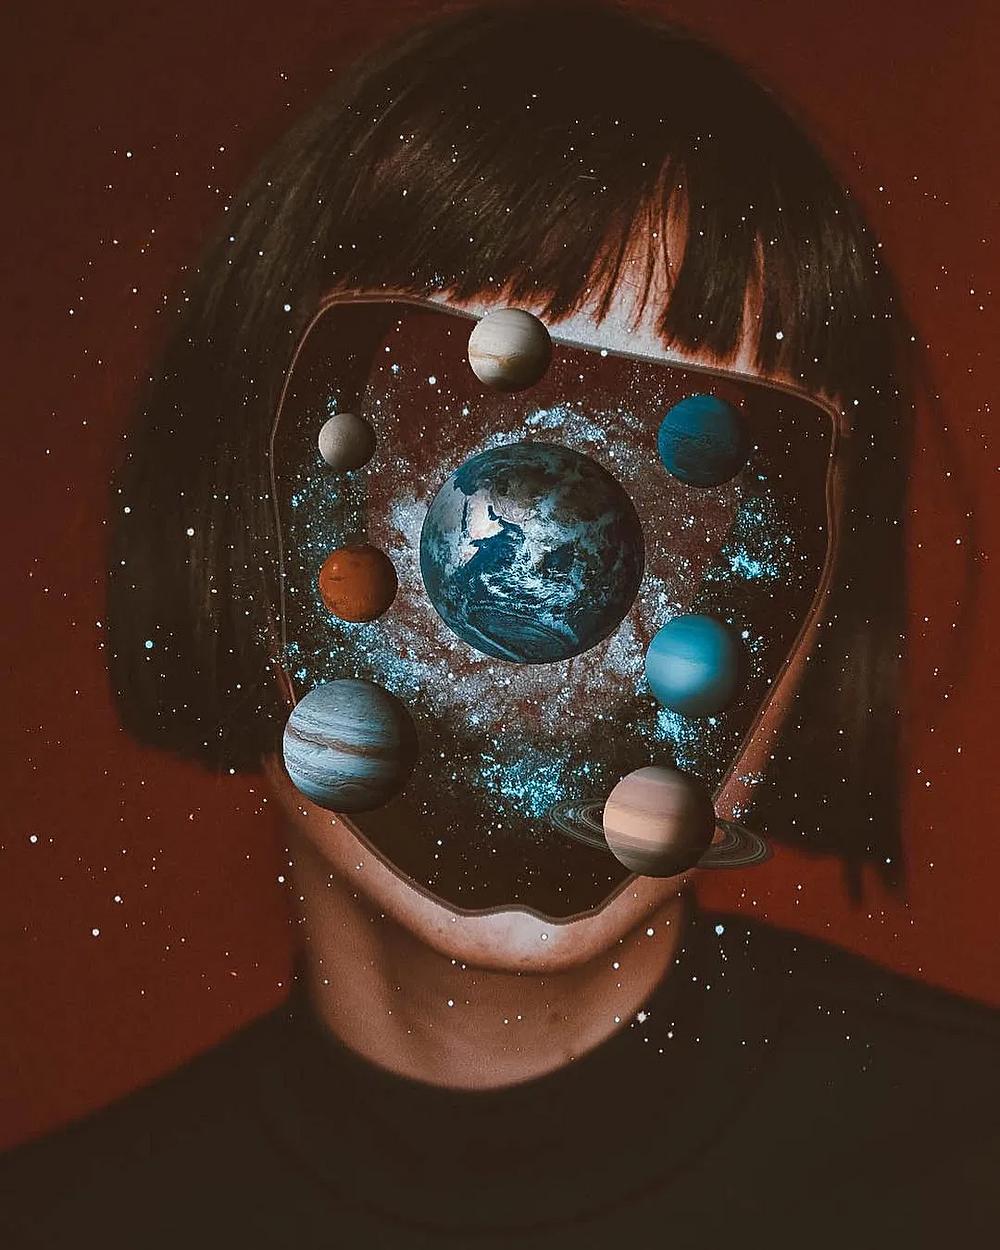 Psychedelic Surrealism by Denis Sheckler